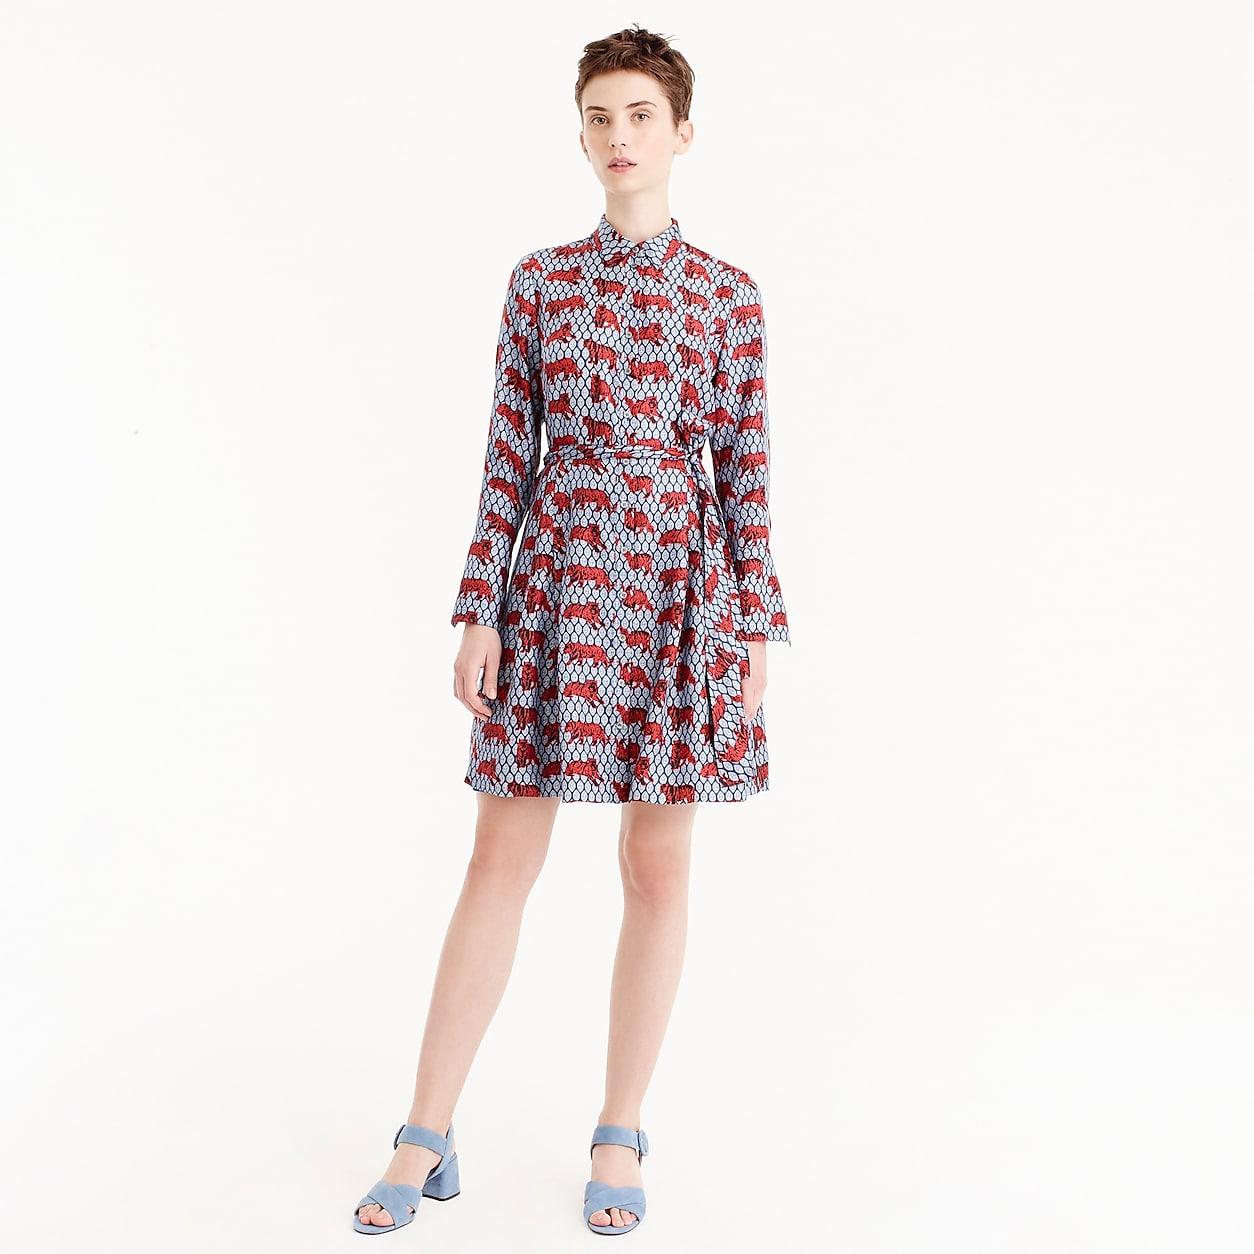 138f4ffe0391d Collection Silk Twill Shirtdress In Roaming Tiger Print